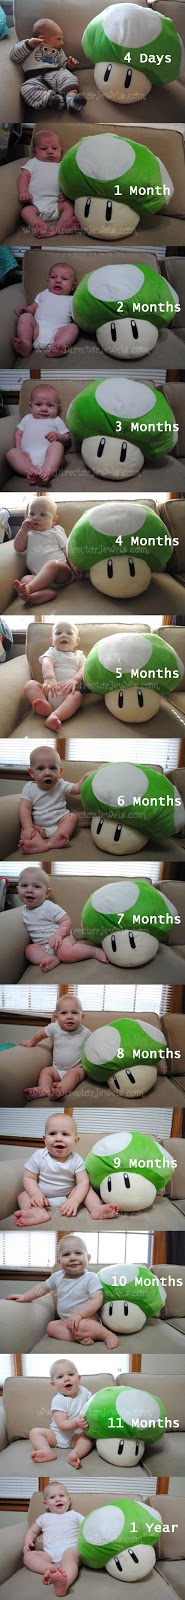 Monthly Baby Growth Photos - 1 Up, Nintendo, Super Mario Bros